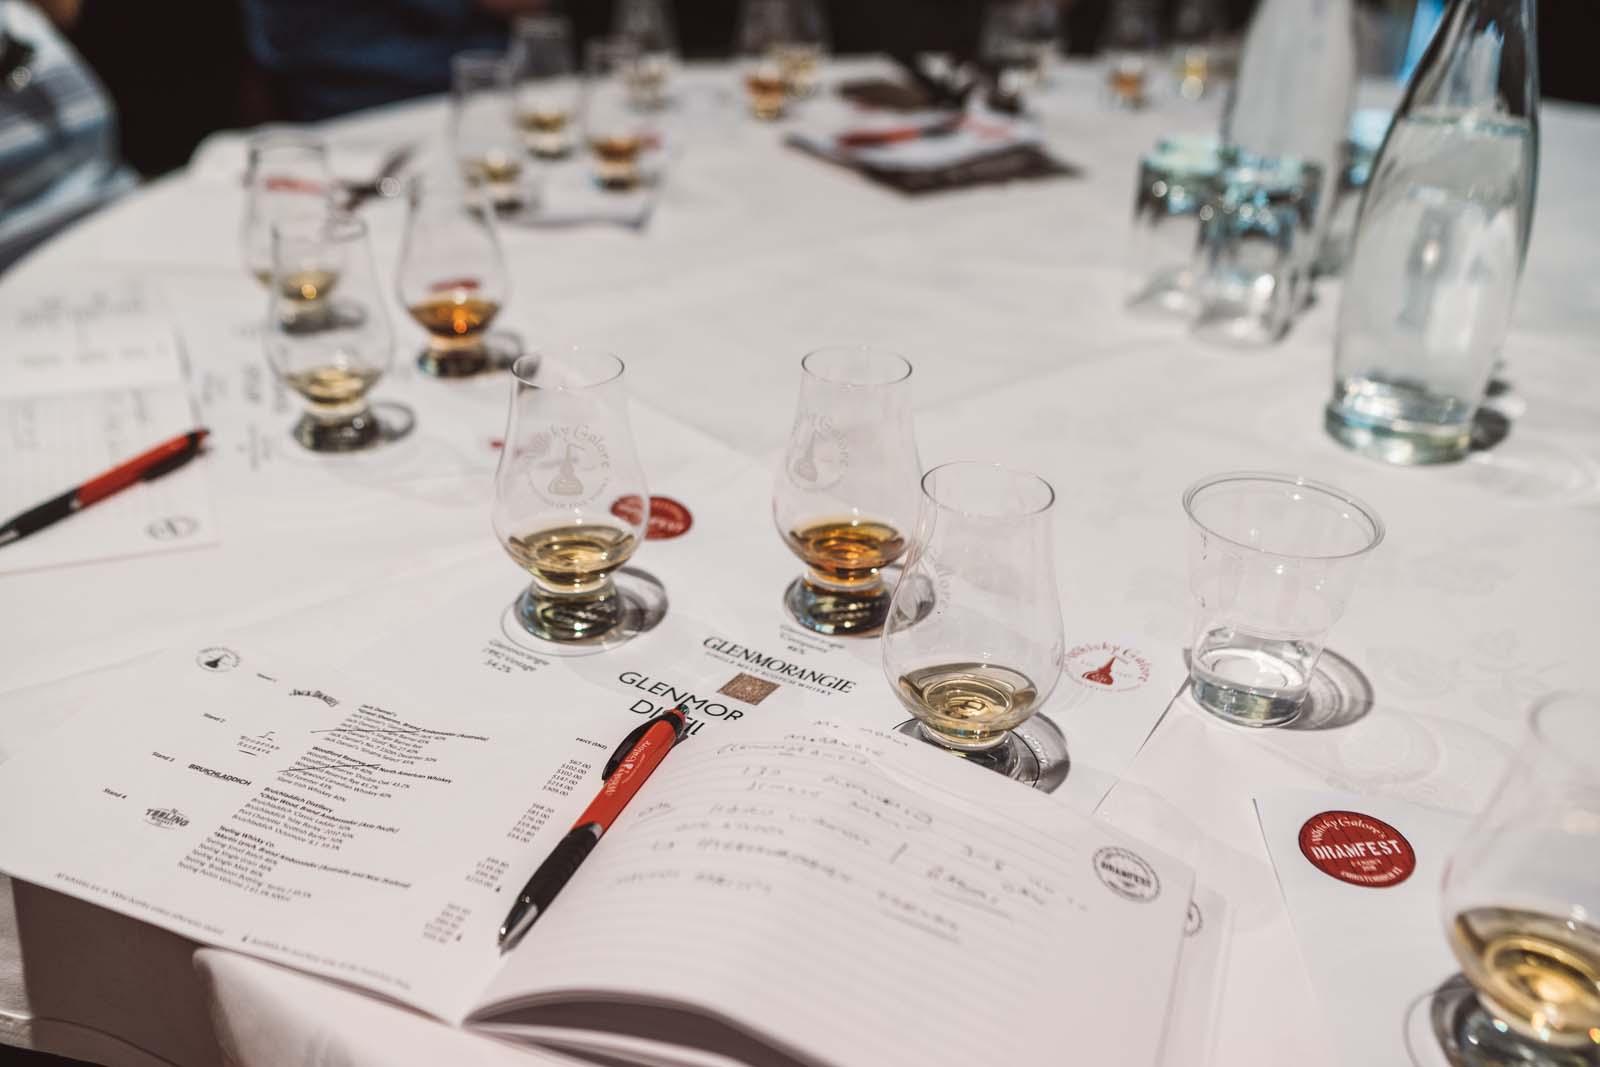 Dramfest 2018 for Whisky Galore-1.jpg